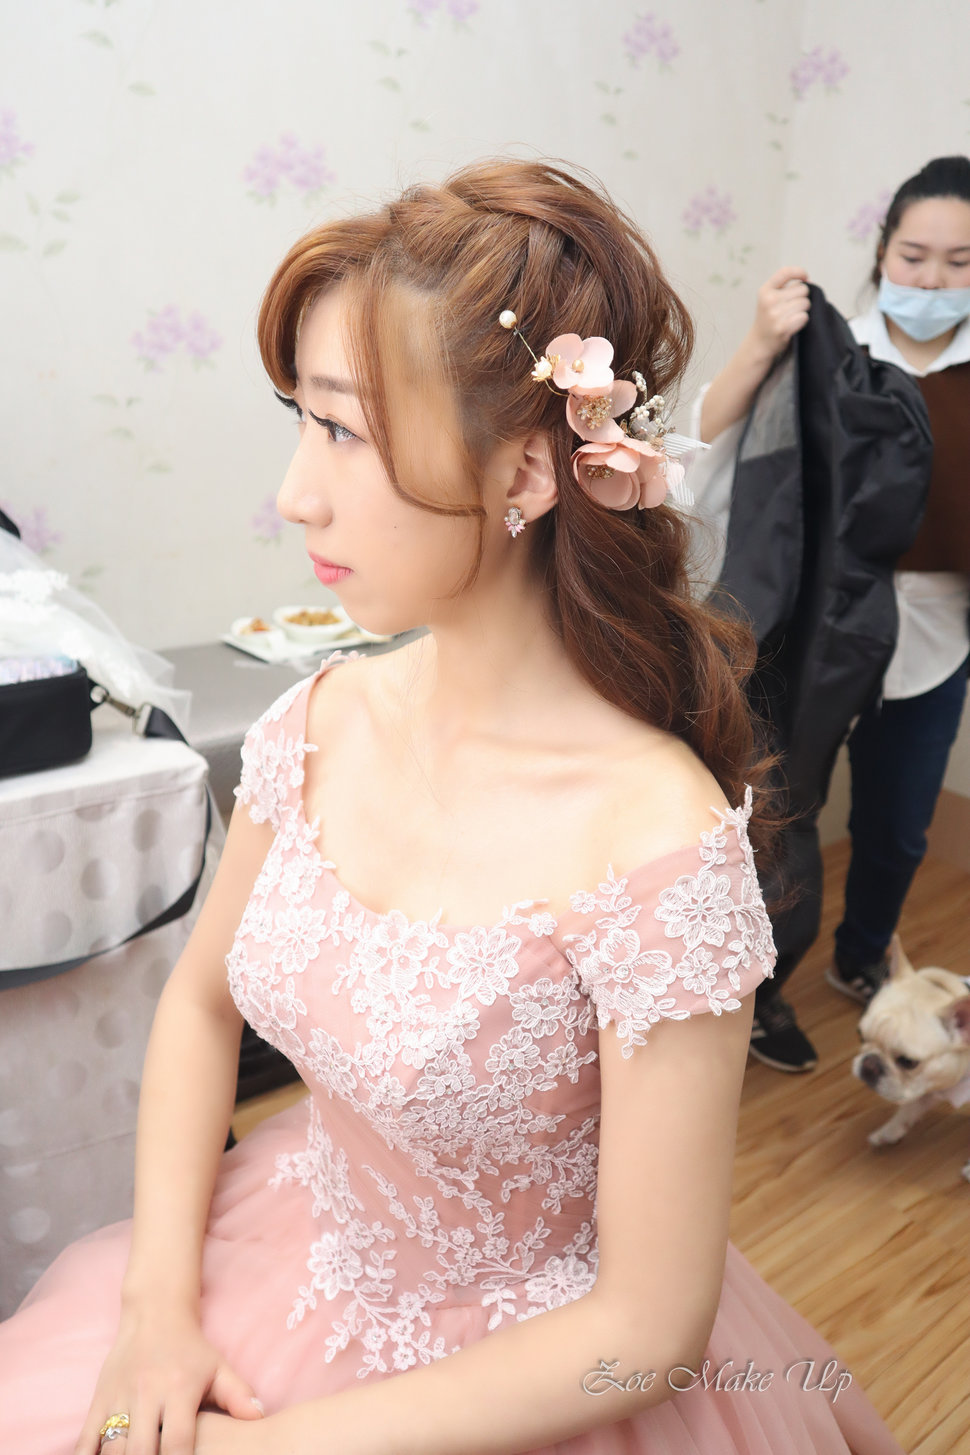 IMG_1268修 - Zoe 幸福時分 新娘秘書《結婚吧》